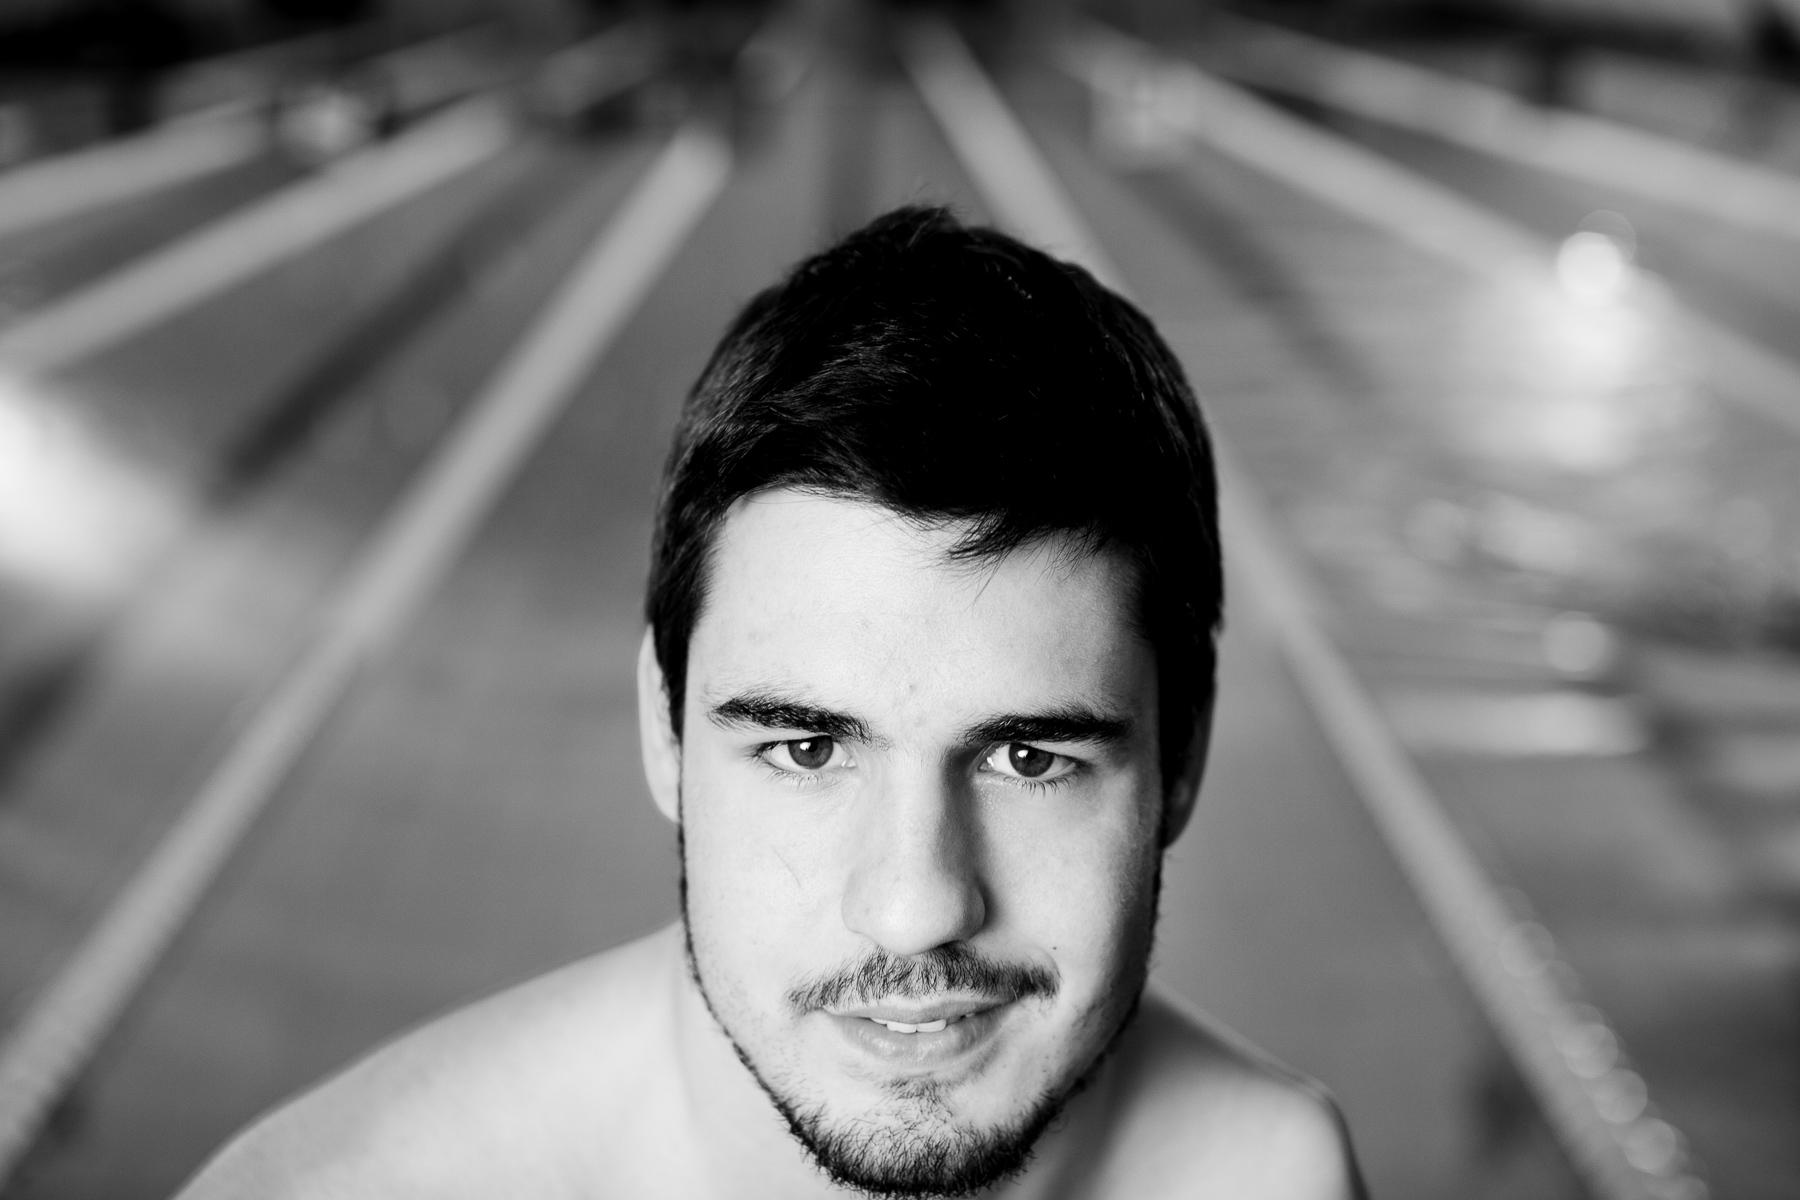 Portrait of Slovenian paraswimmer Darko Đurič by Luka Dakskobler.